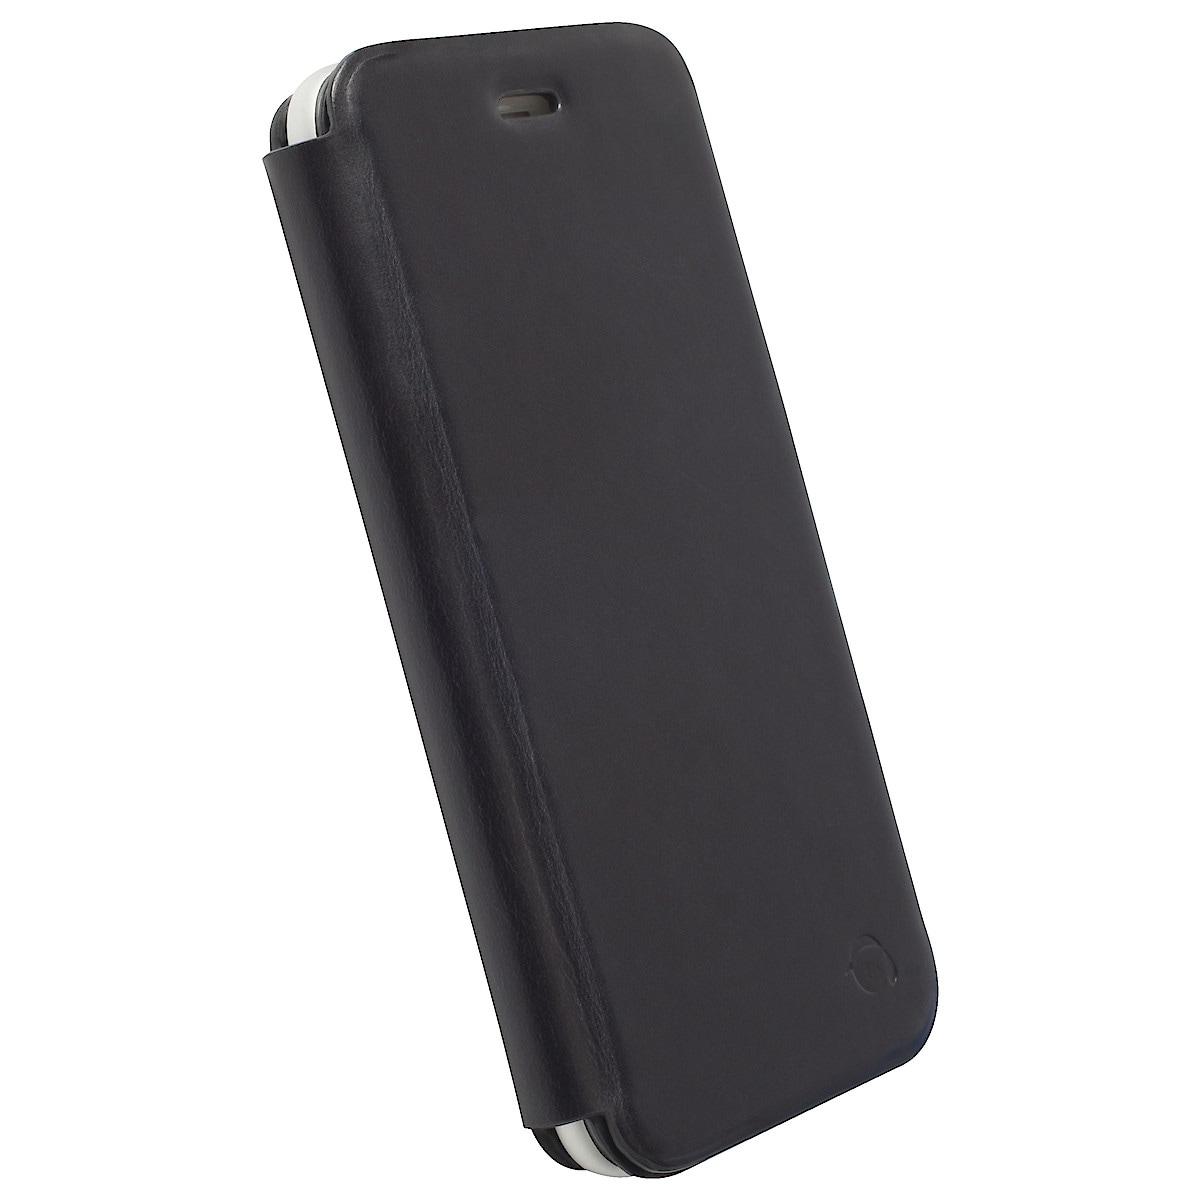 Taschenportemonnaie für iPhone 6/5S, Krusell Kiruna